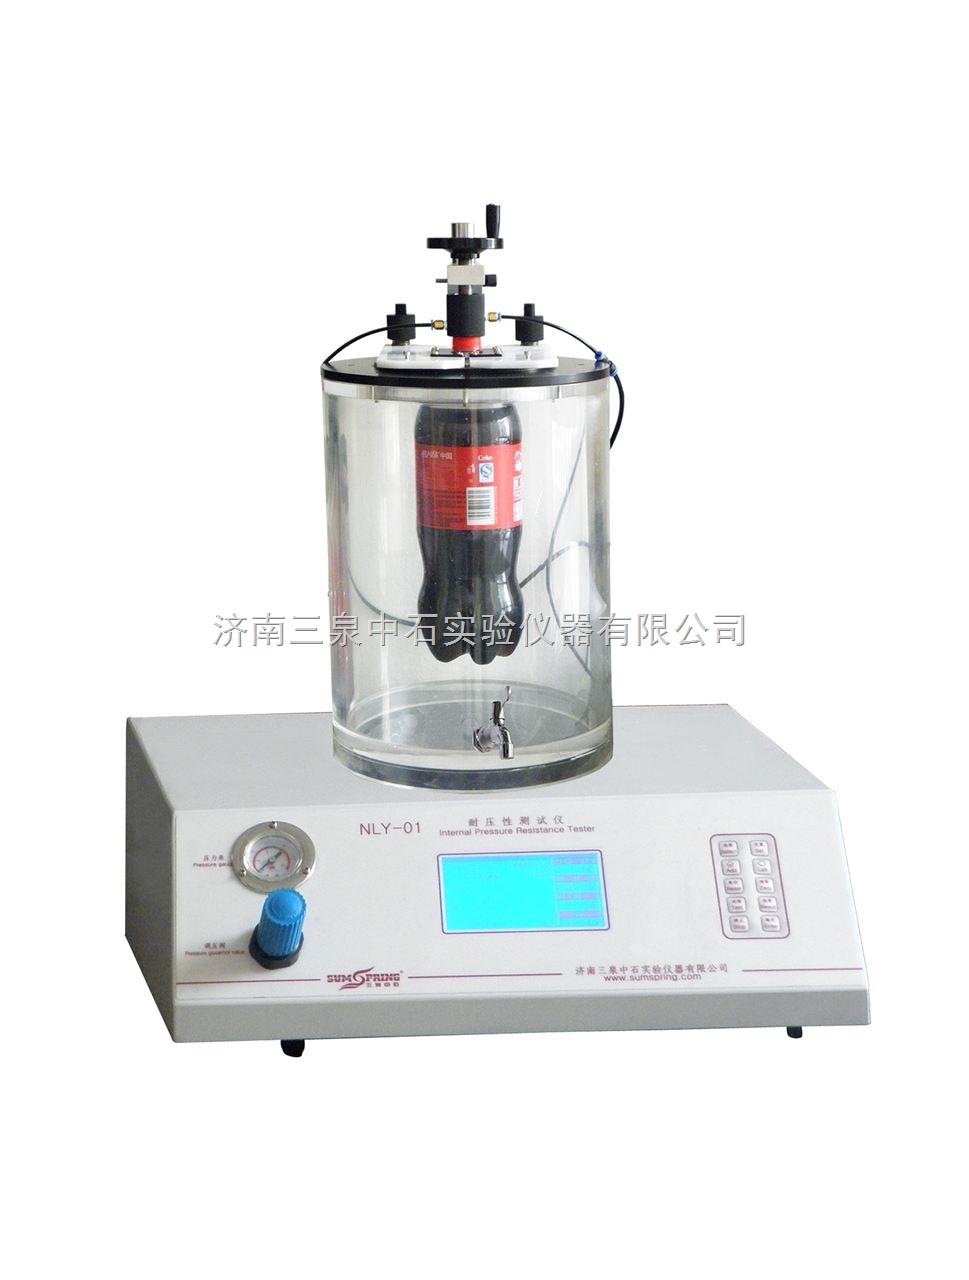 QB/T1868碳酸饮料瓶二氧化碳损失率测定仪 PET瓶二氧化碳泄露性能测试仪